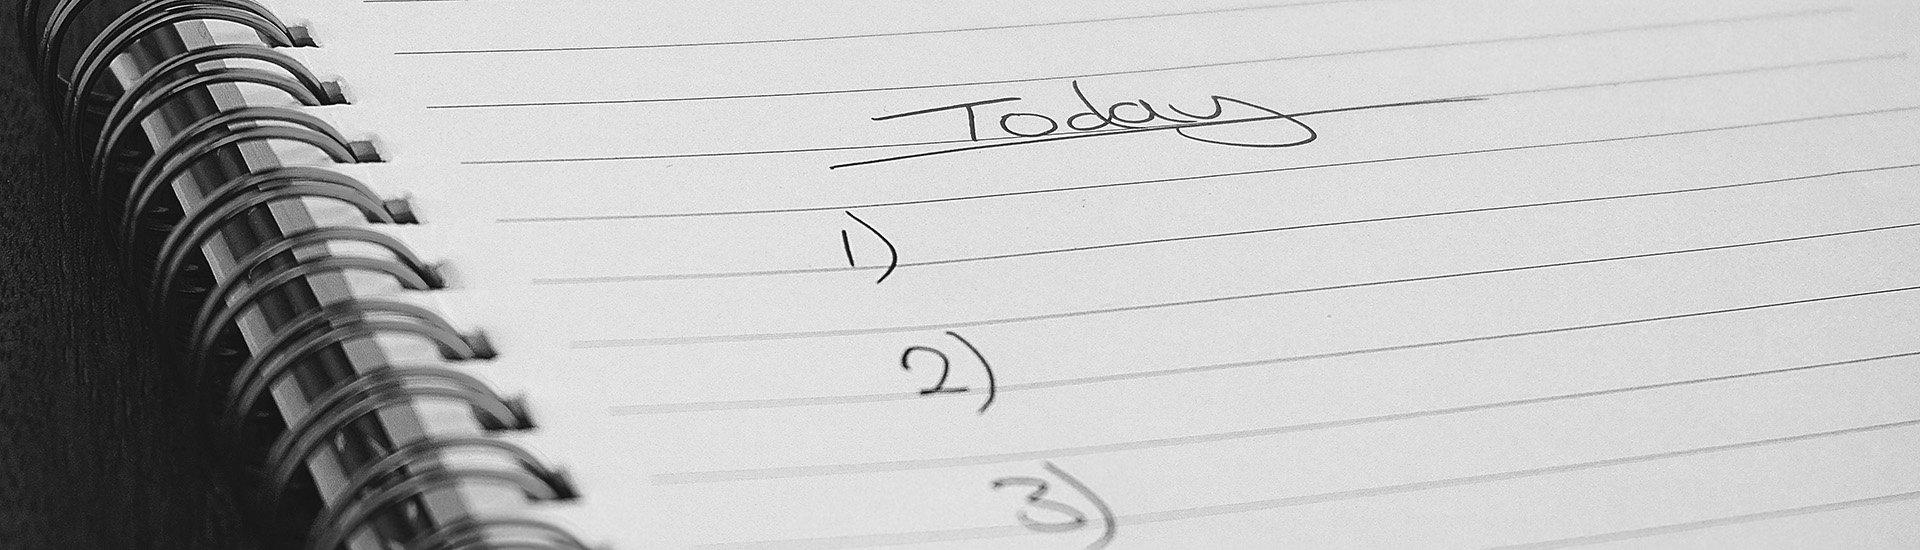 to-do-list-checklist